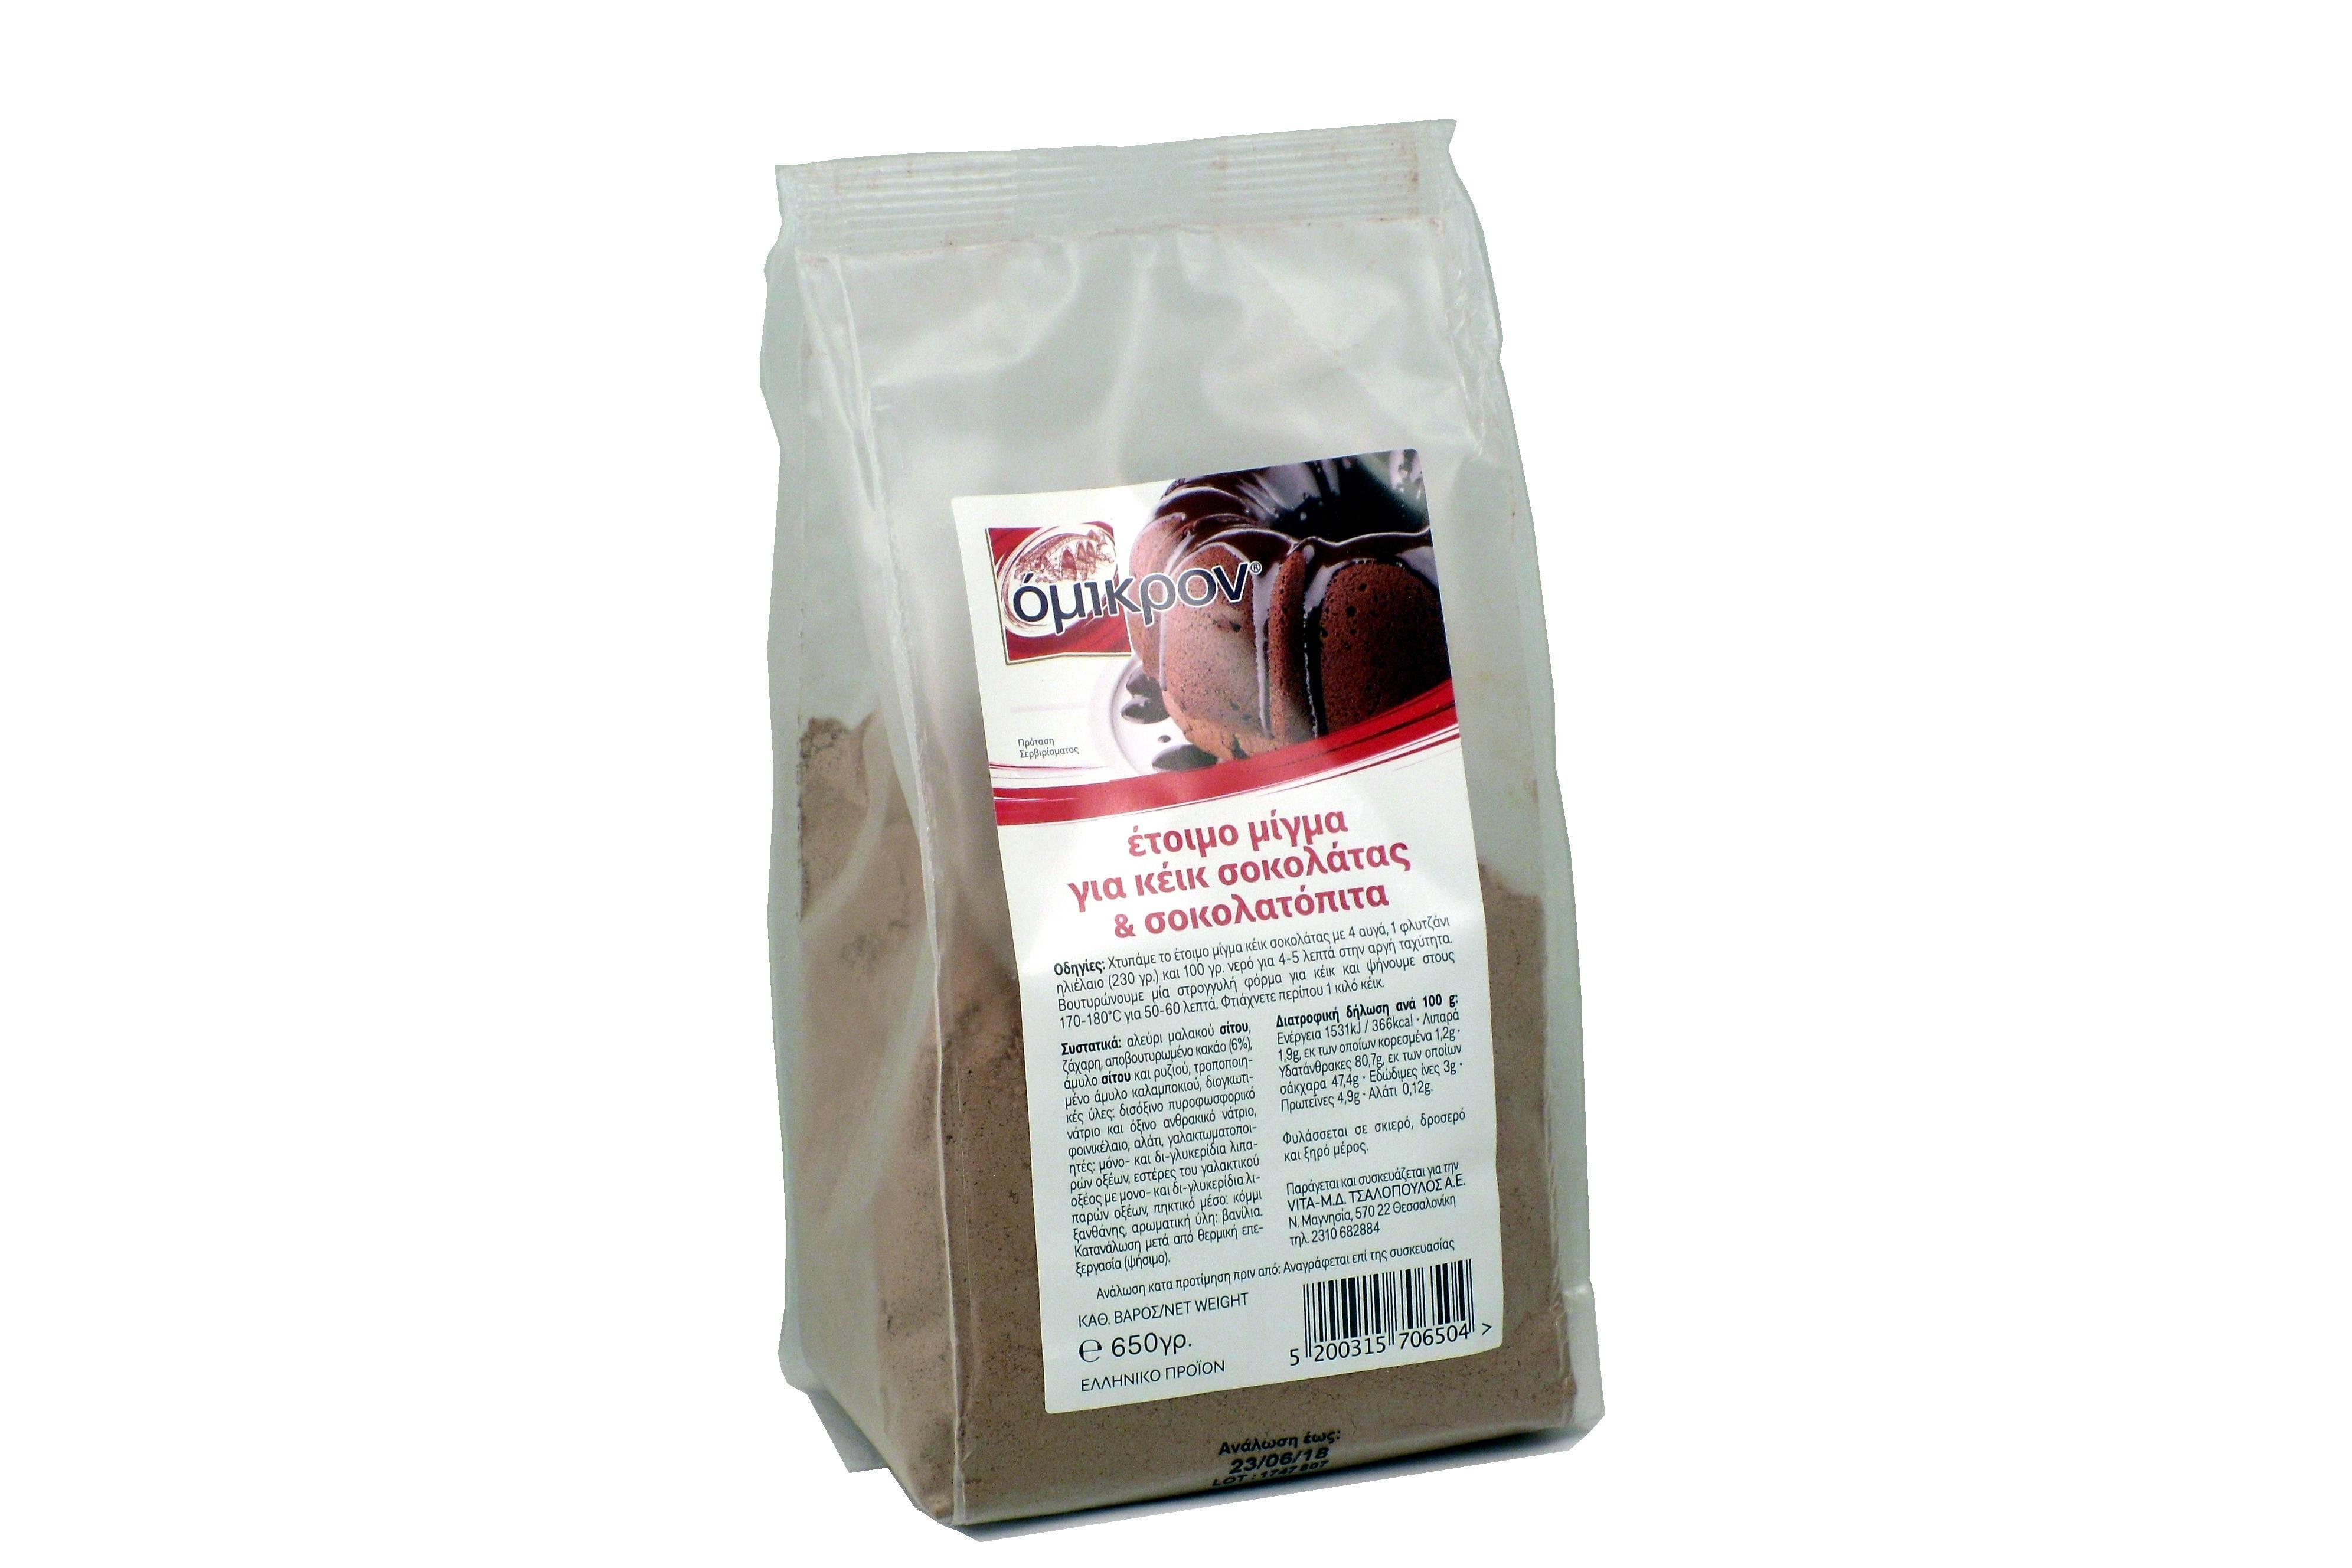 OMIKRON CHOCO CAKE MIX 650g - Code 16006001